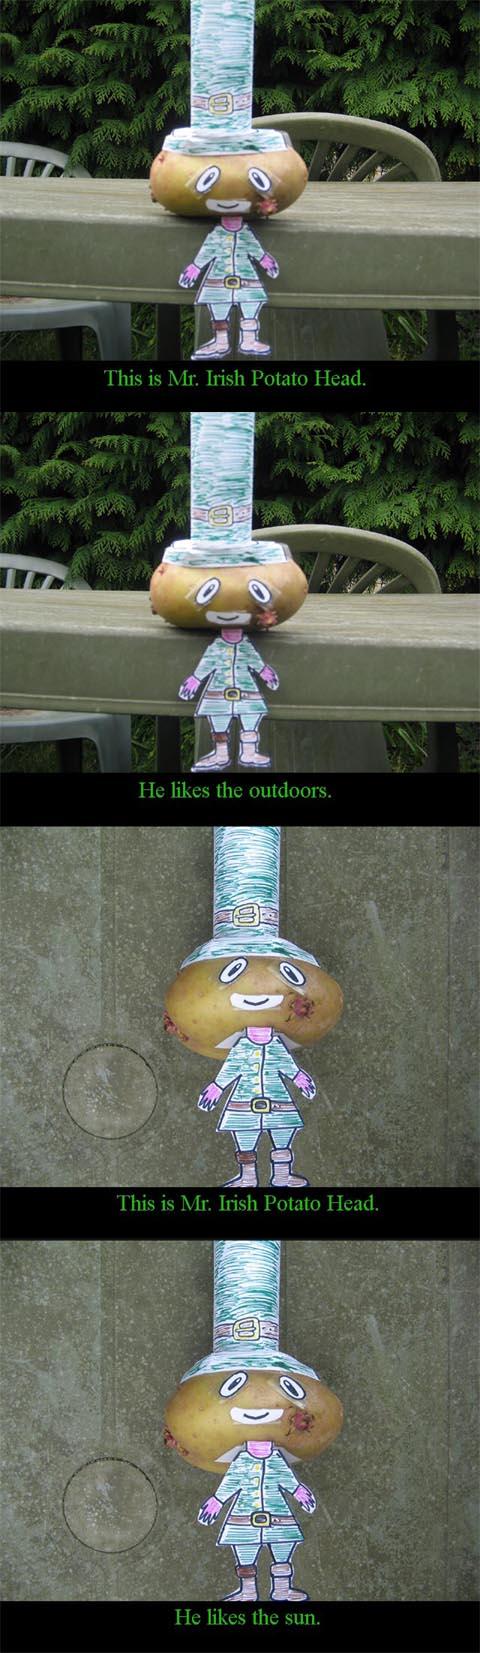 This is Mr. Irish Potato Head by Judan